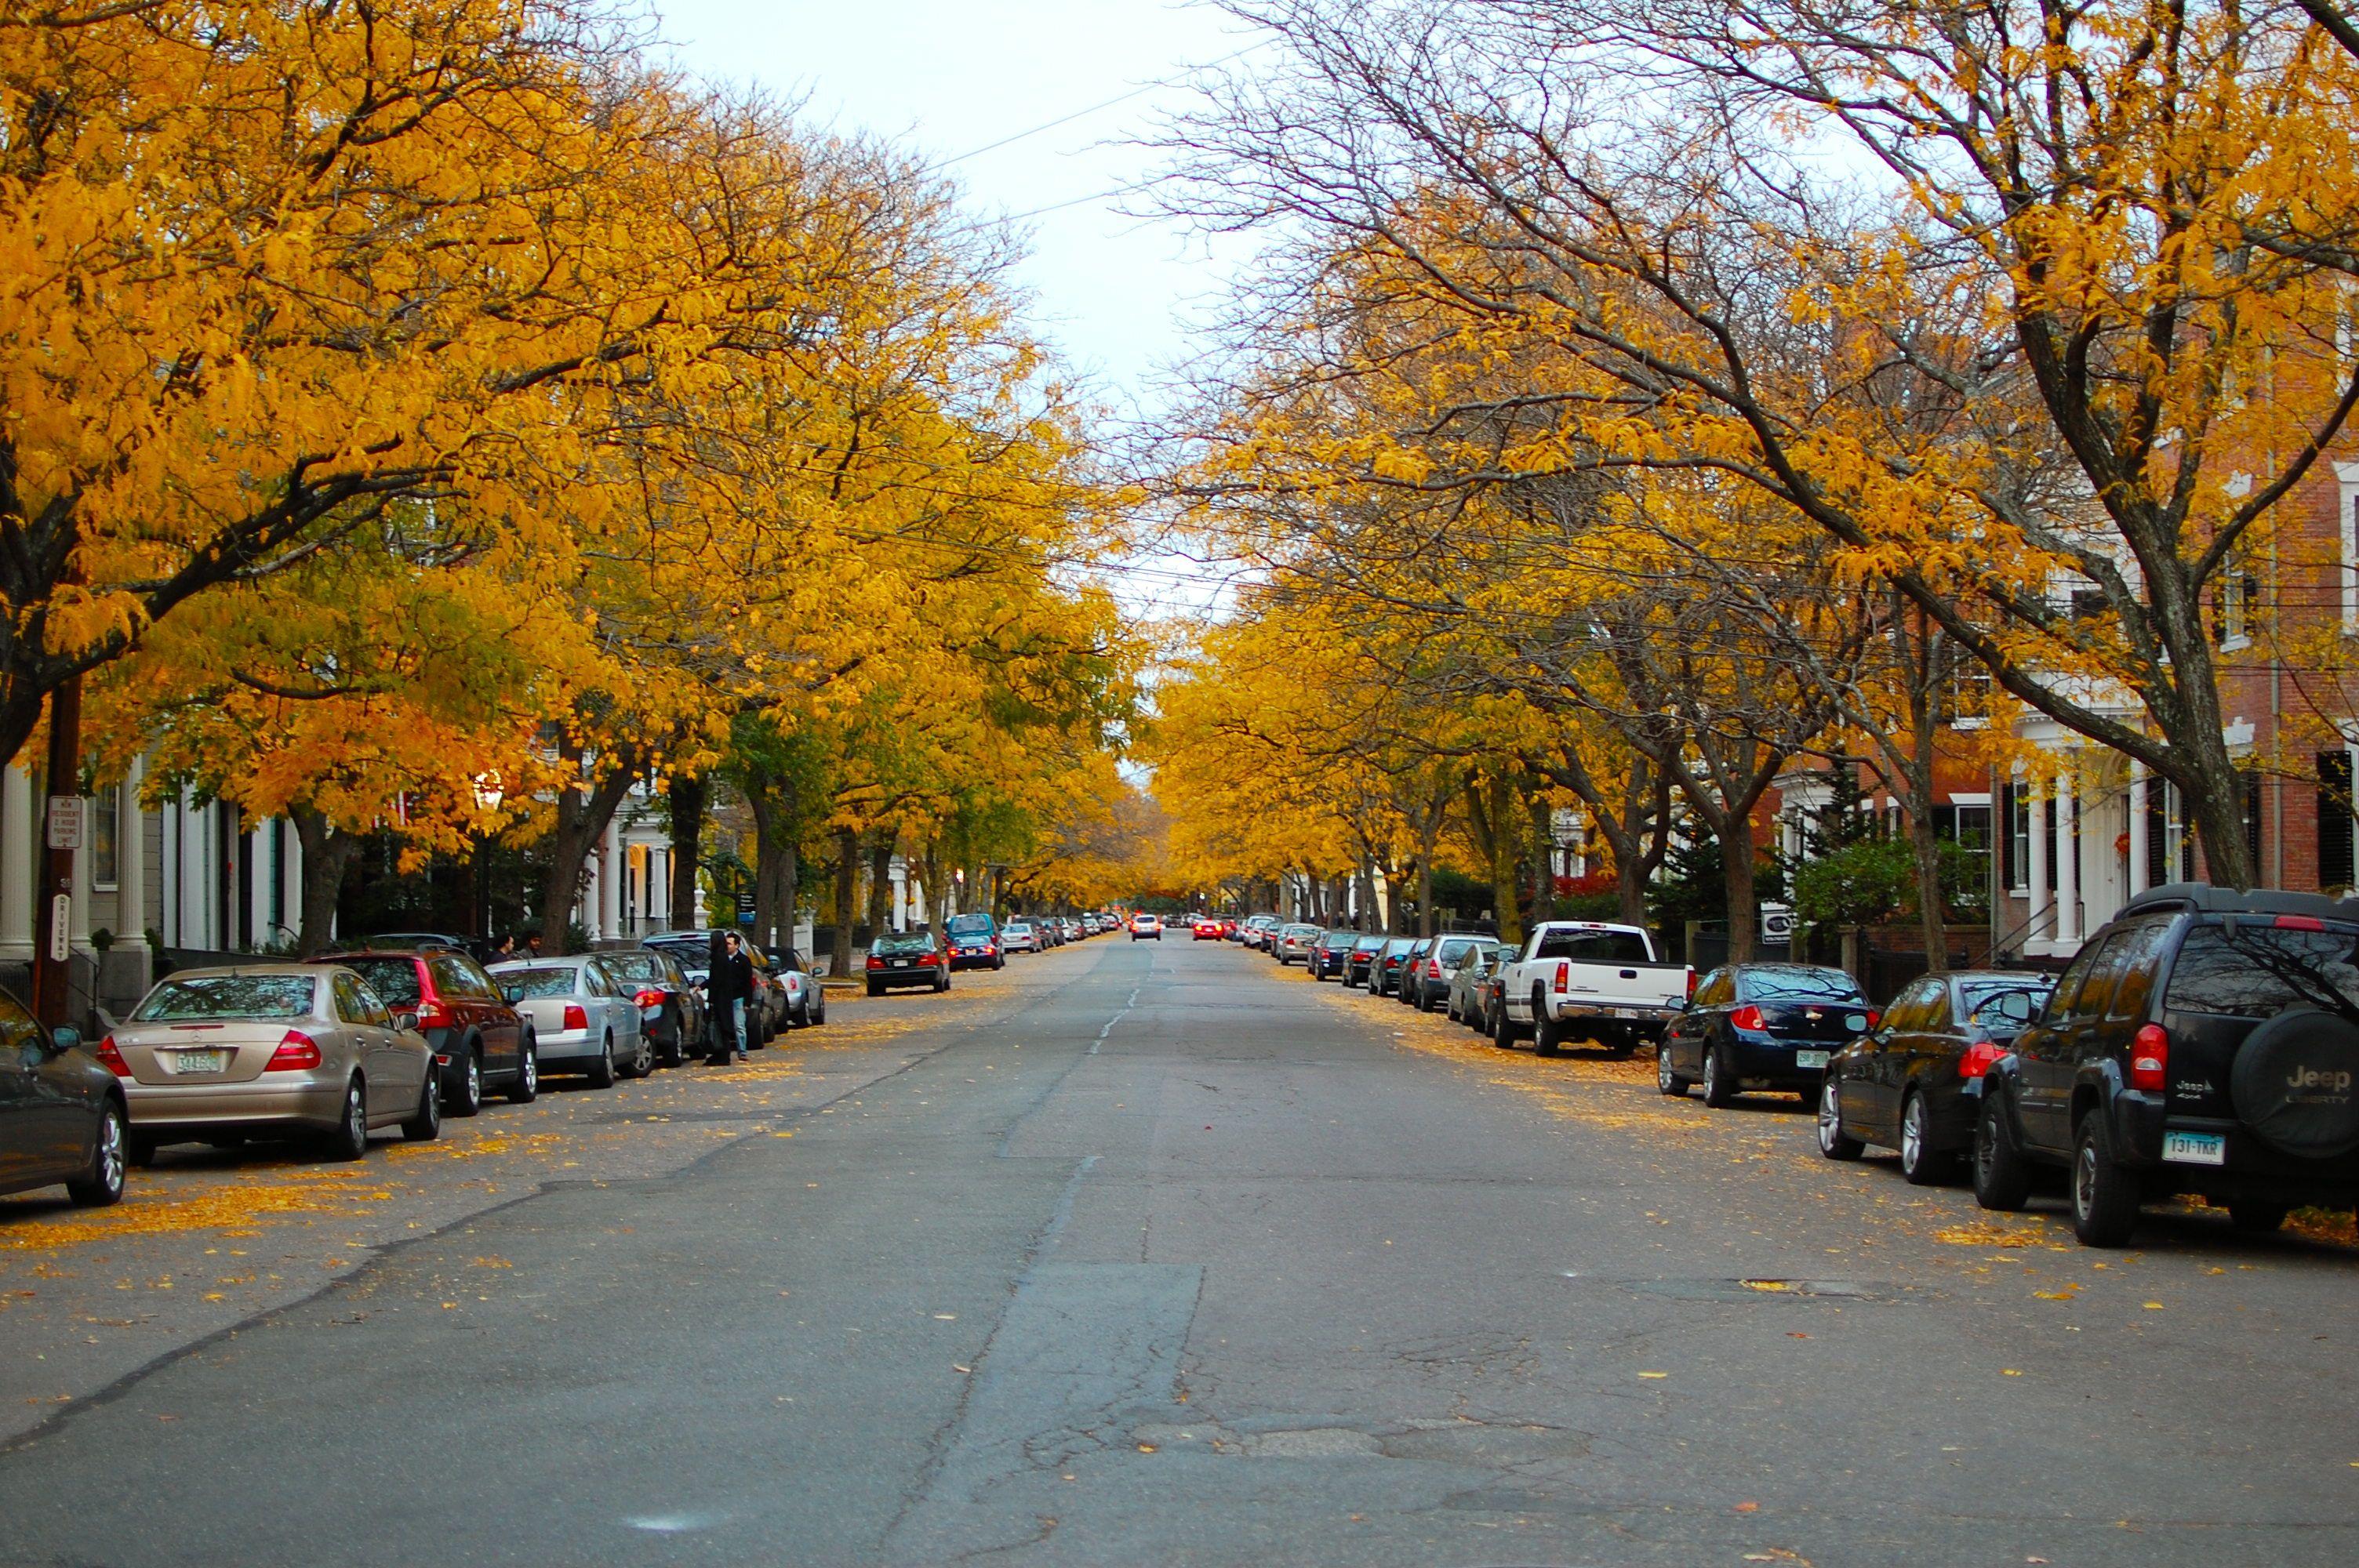 File:Chestnut Street Salem.jpg - Wikimedia Commons